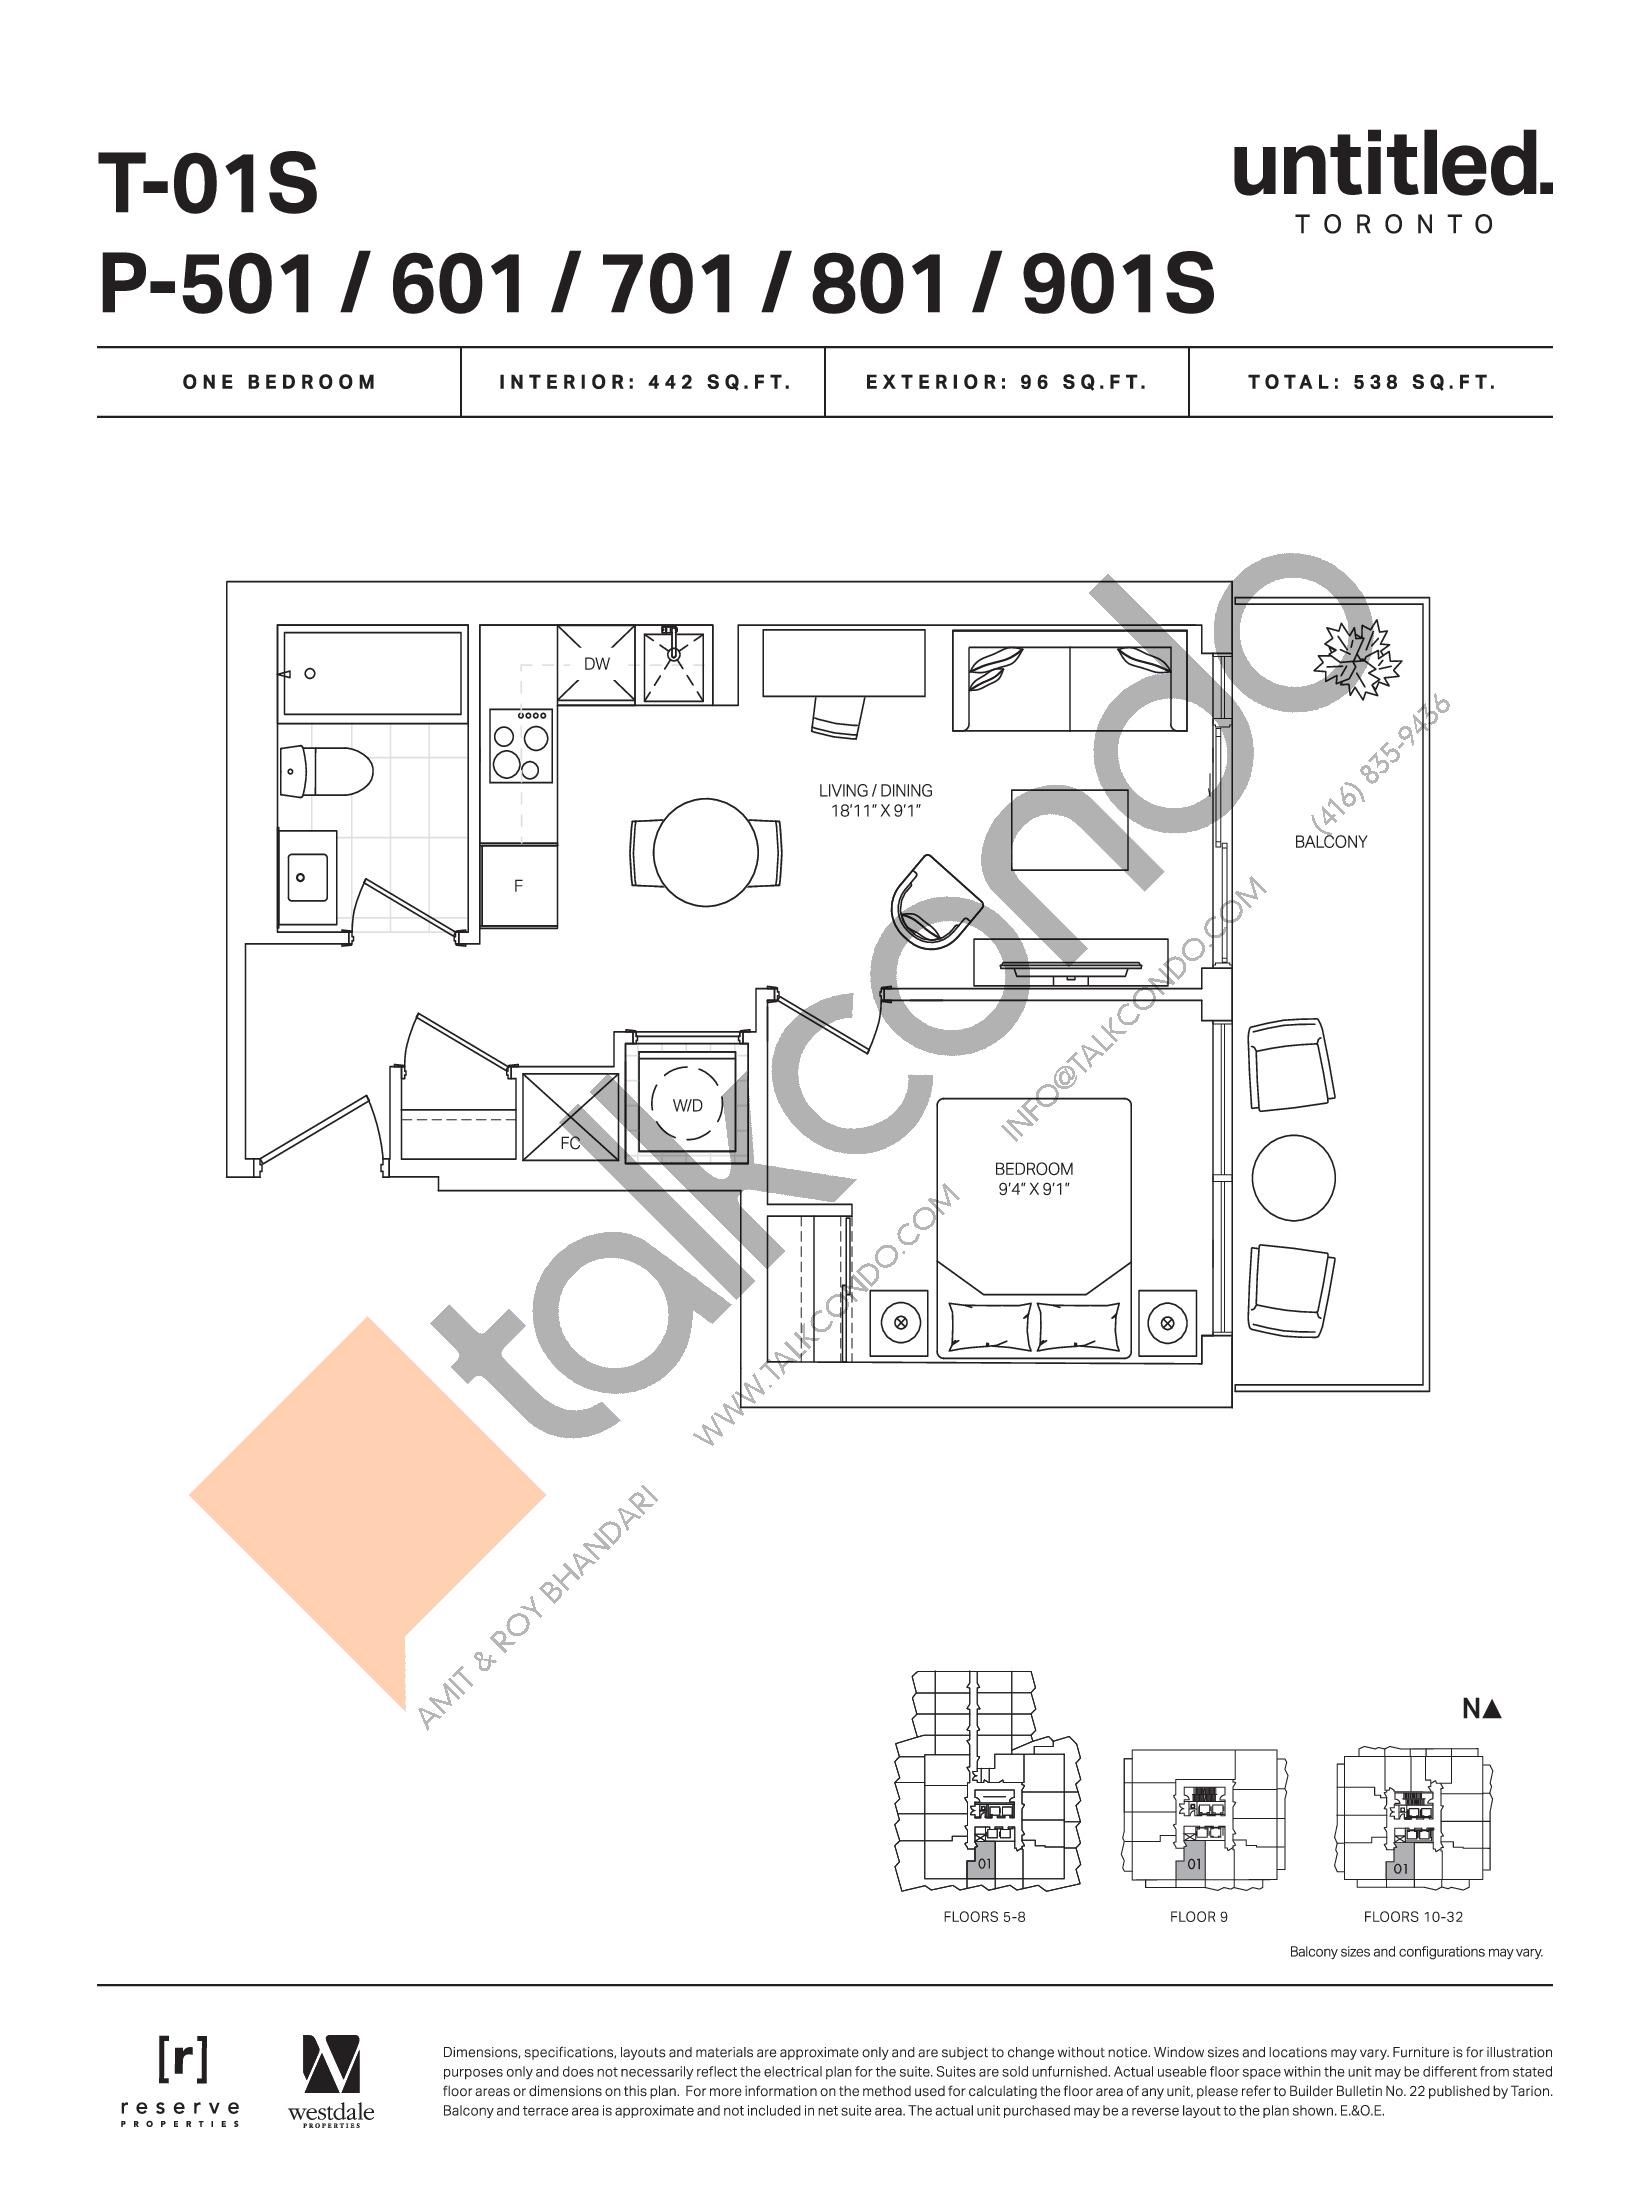 T-01S / P-501 / 601/ 701 / 801 / 901S  Floor Plan at Untitled Toronto Condos - 442 sq.ft